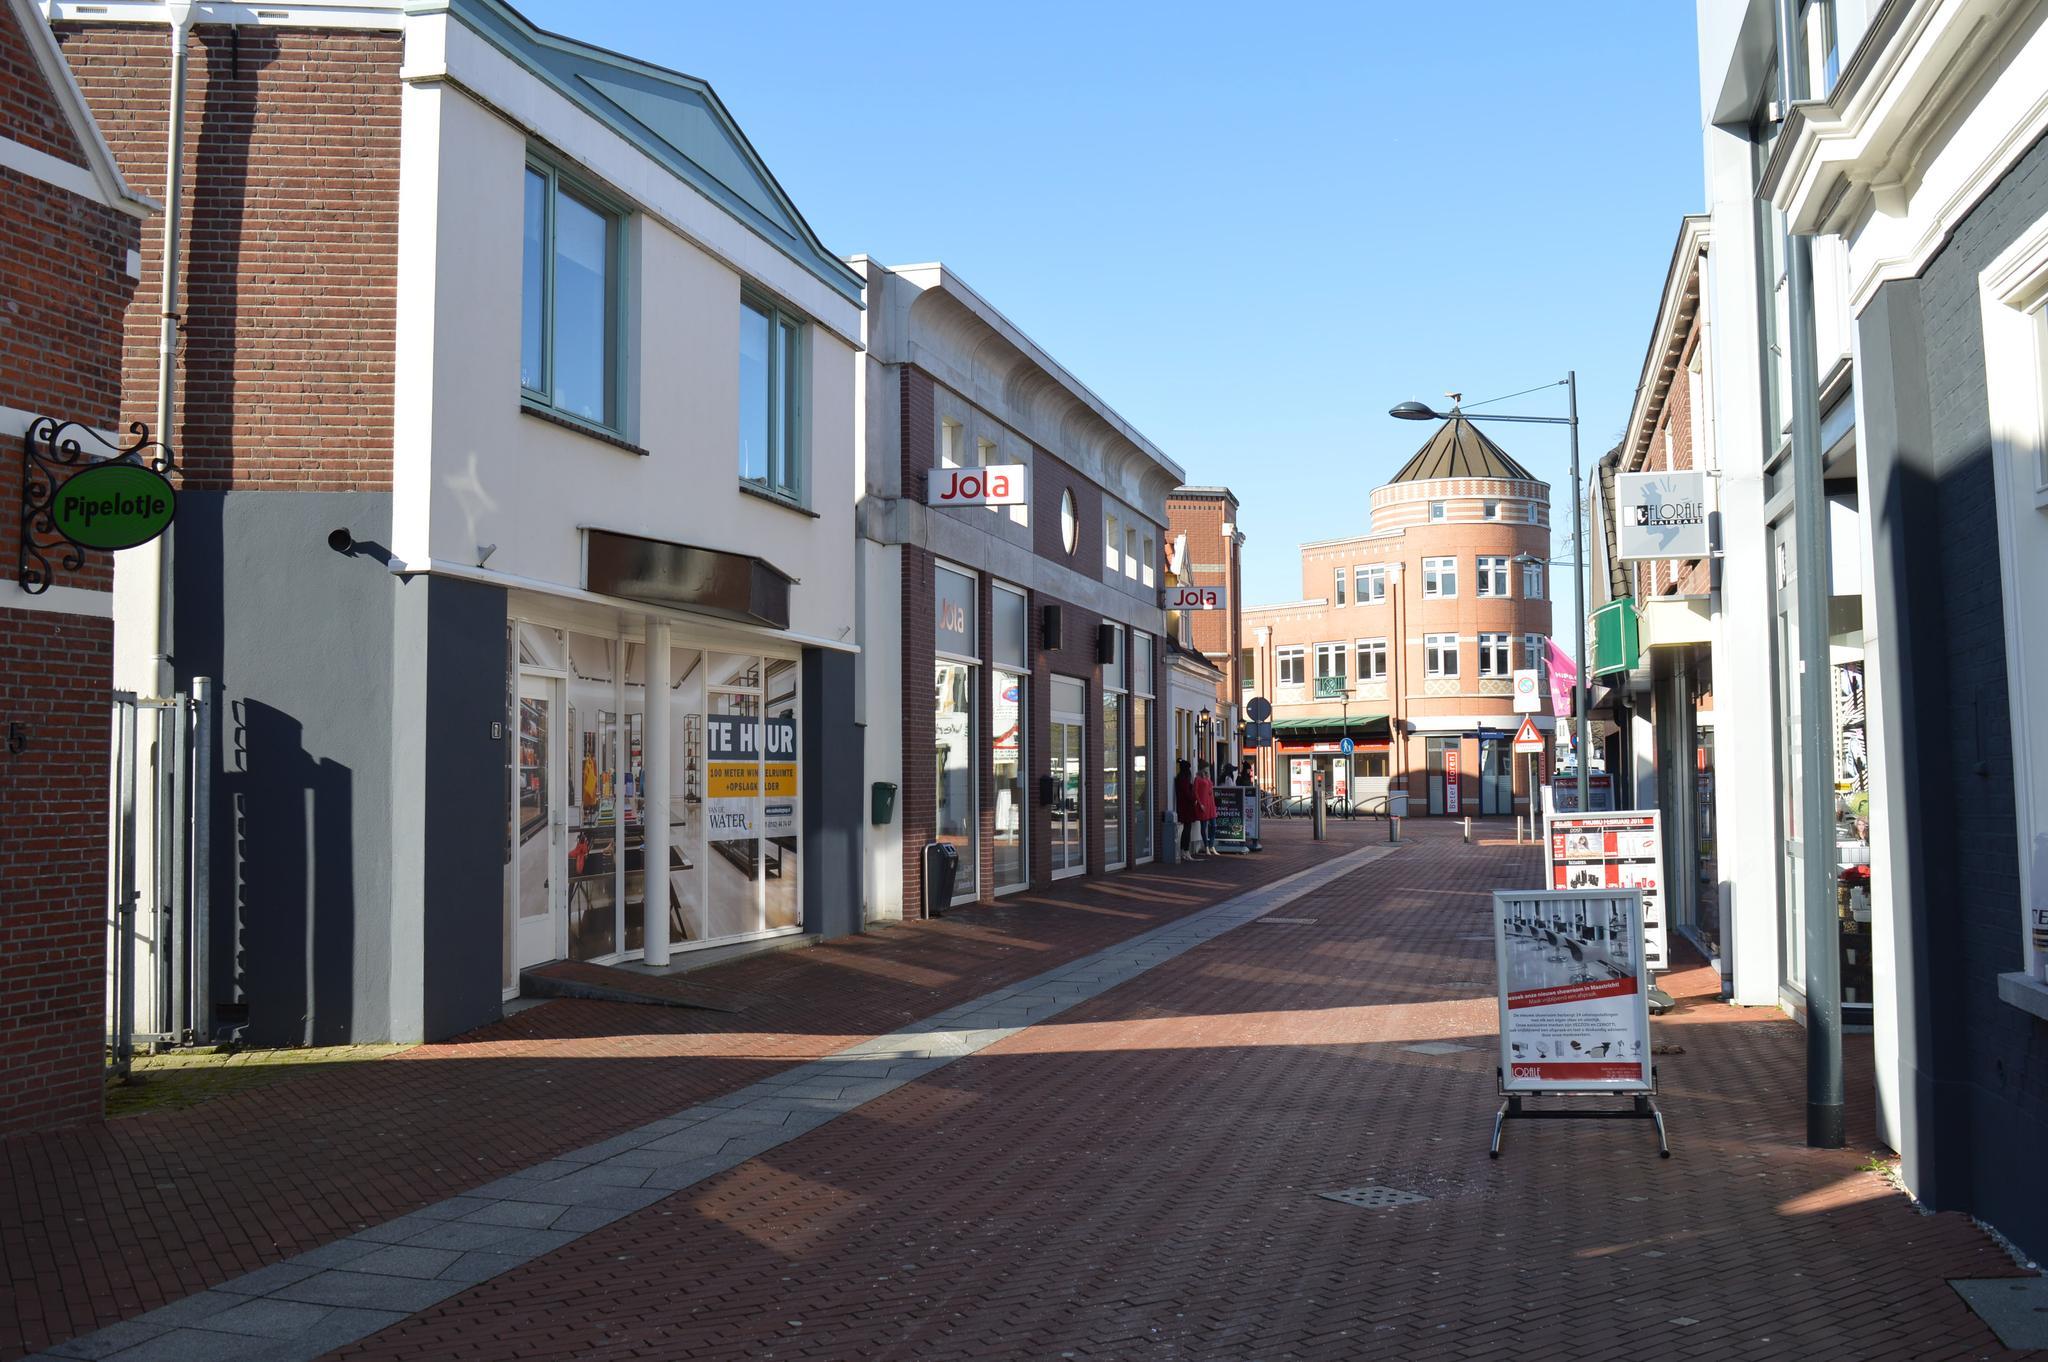 Nieuwstraat 7 In Oosterhout 4901 Jh Winkelruimte Te Huur Oosterhout